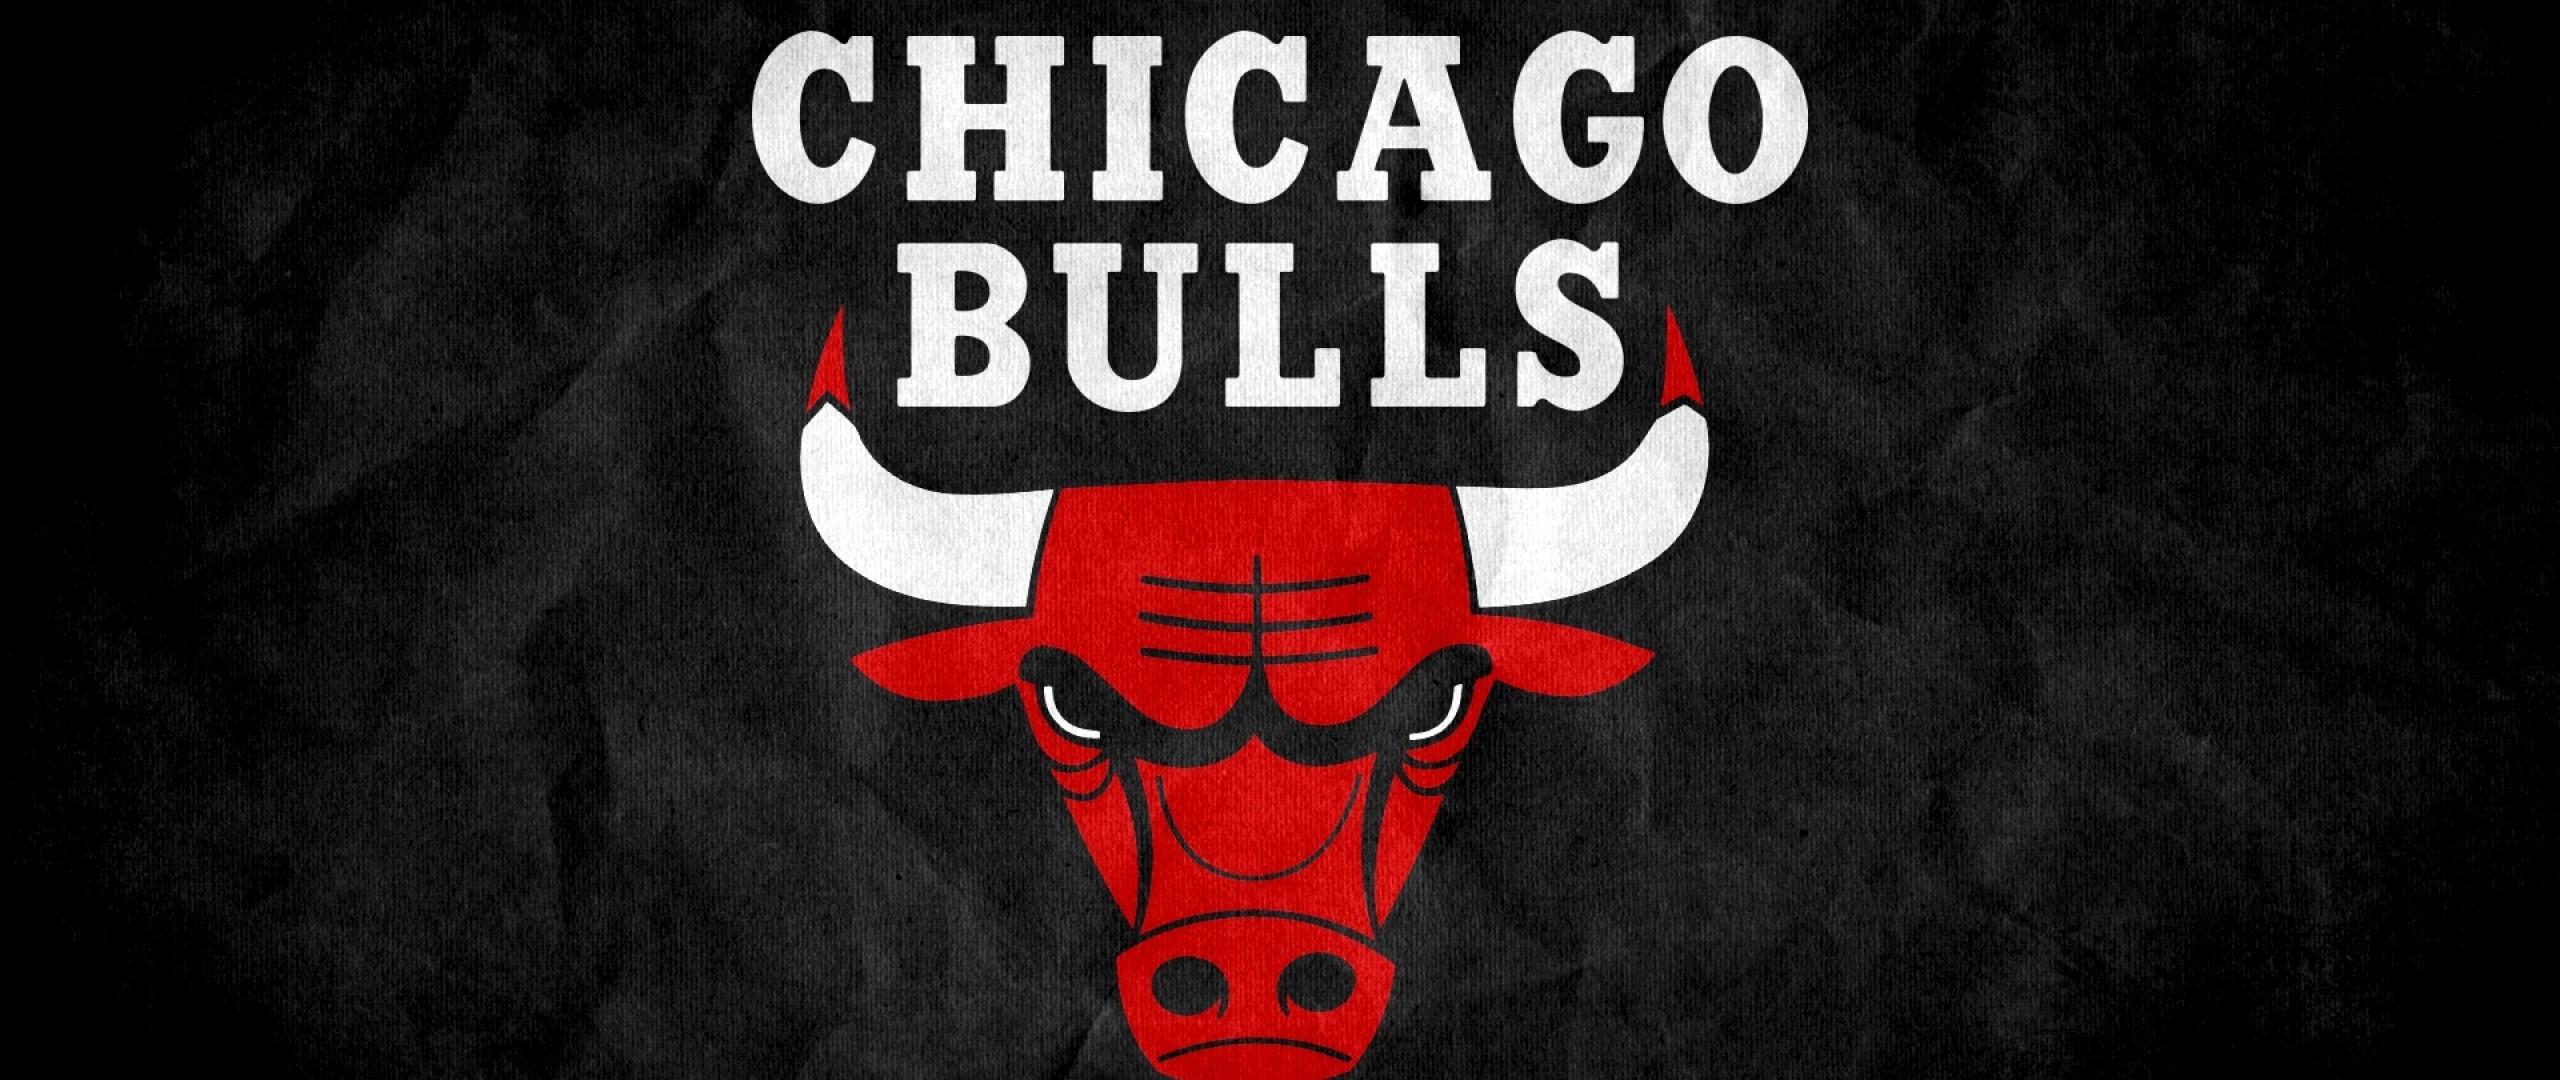 chicago bulls iphone background